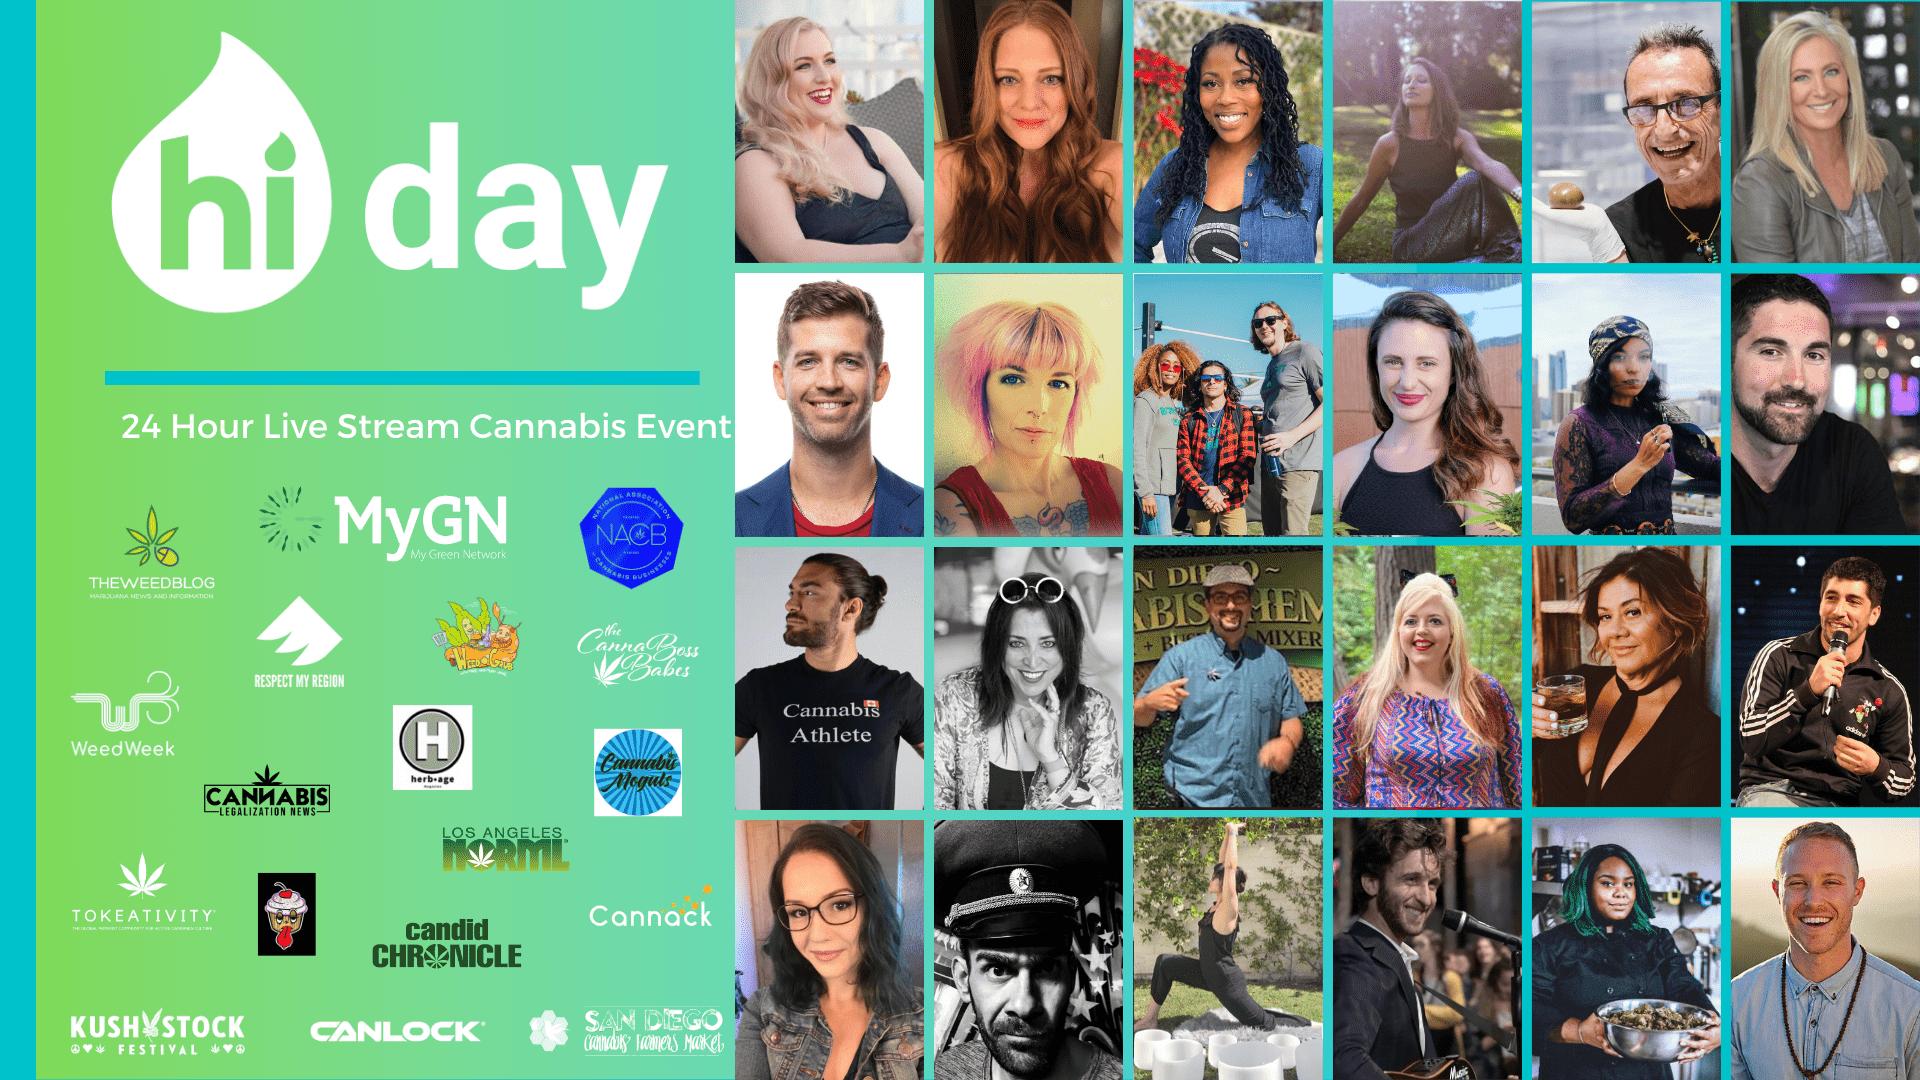 hi day 2020 (Online Event)